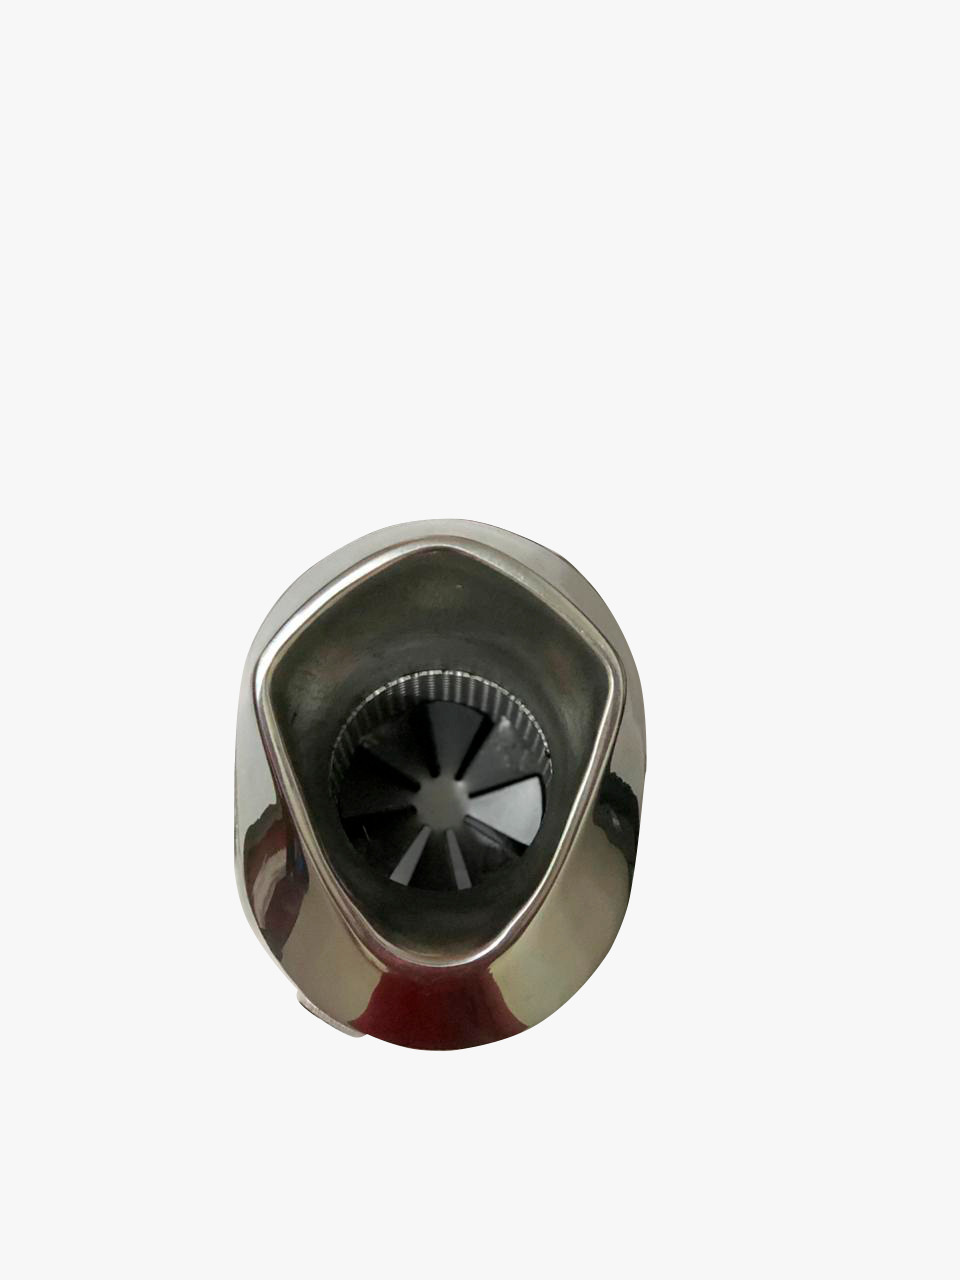 Escape / Ponteira Wacs Modelo WEAGLE Oval - XRE 300 - Honda